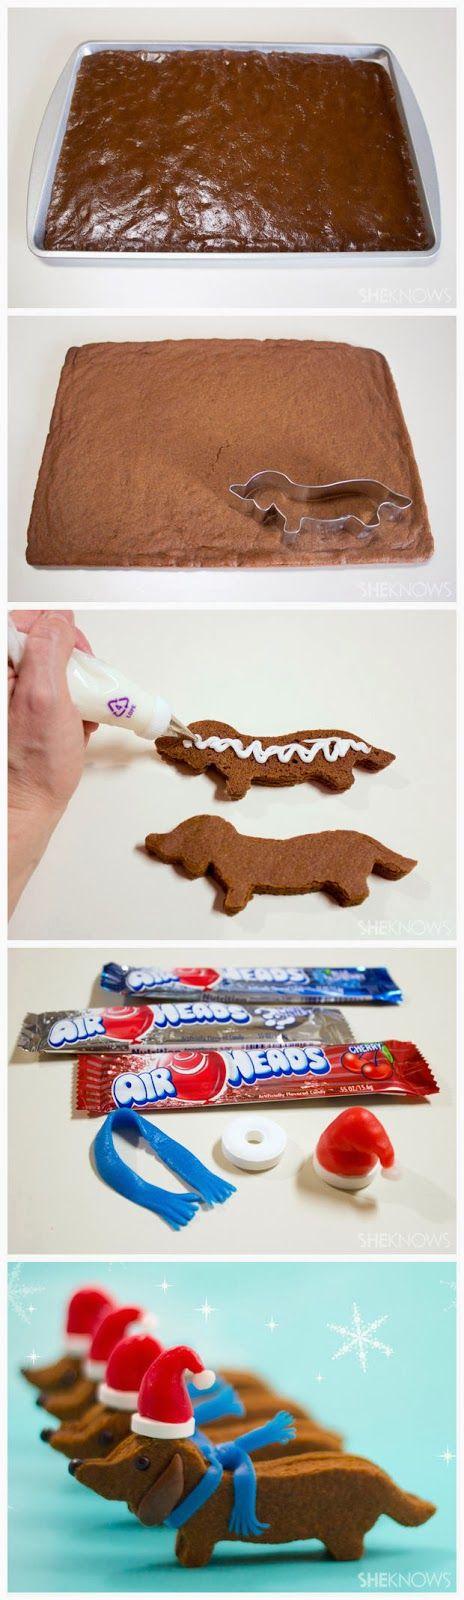 Wiener Dog Santa Cookies ~ so cute and fun